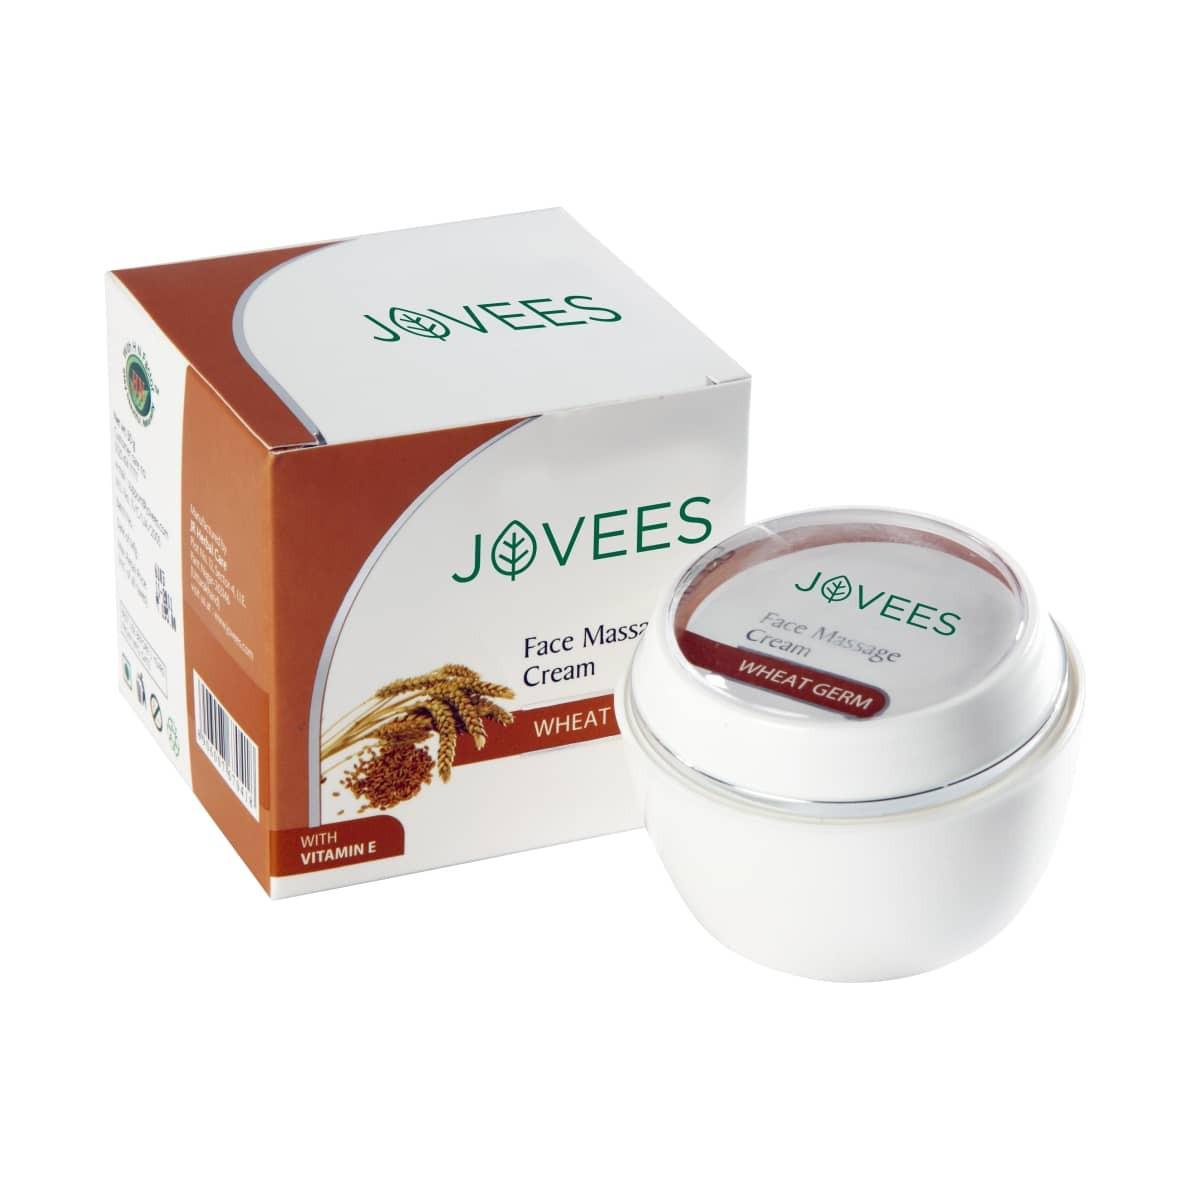 Jovees Wheatgerm with Vitamin E Face Massage Cream